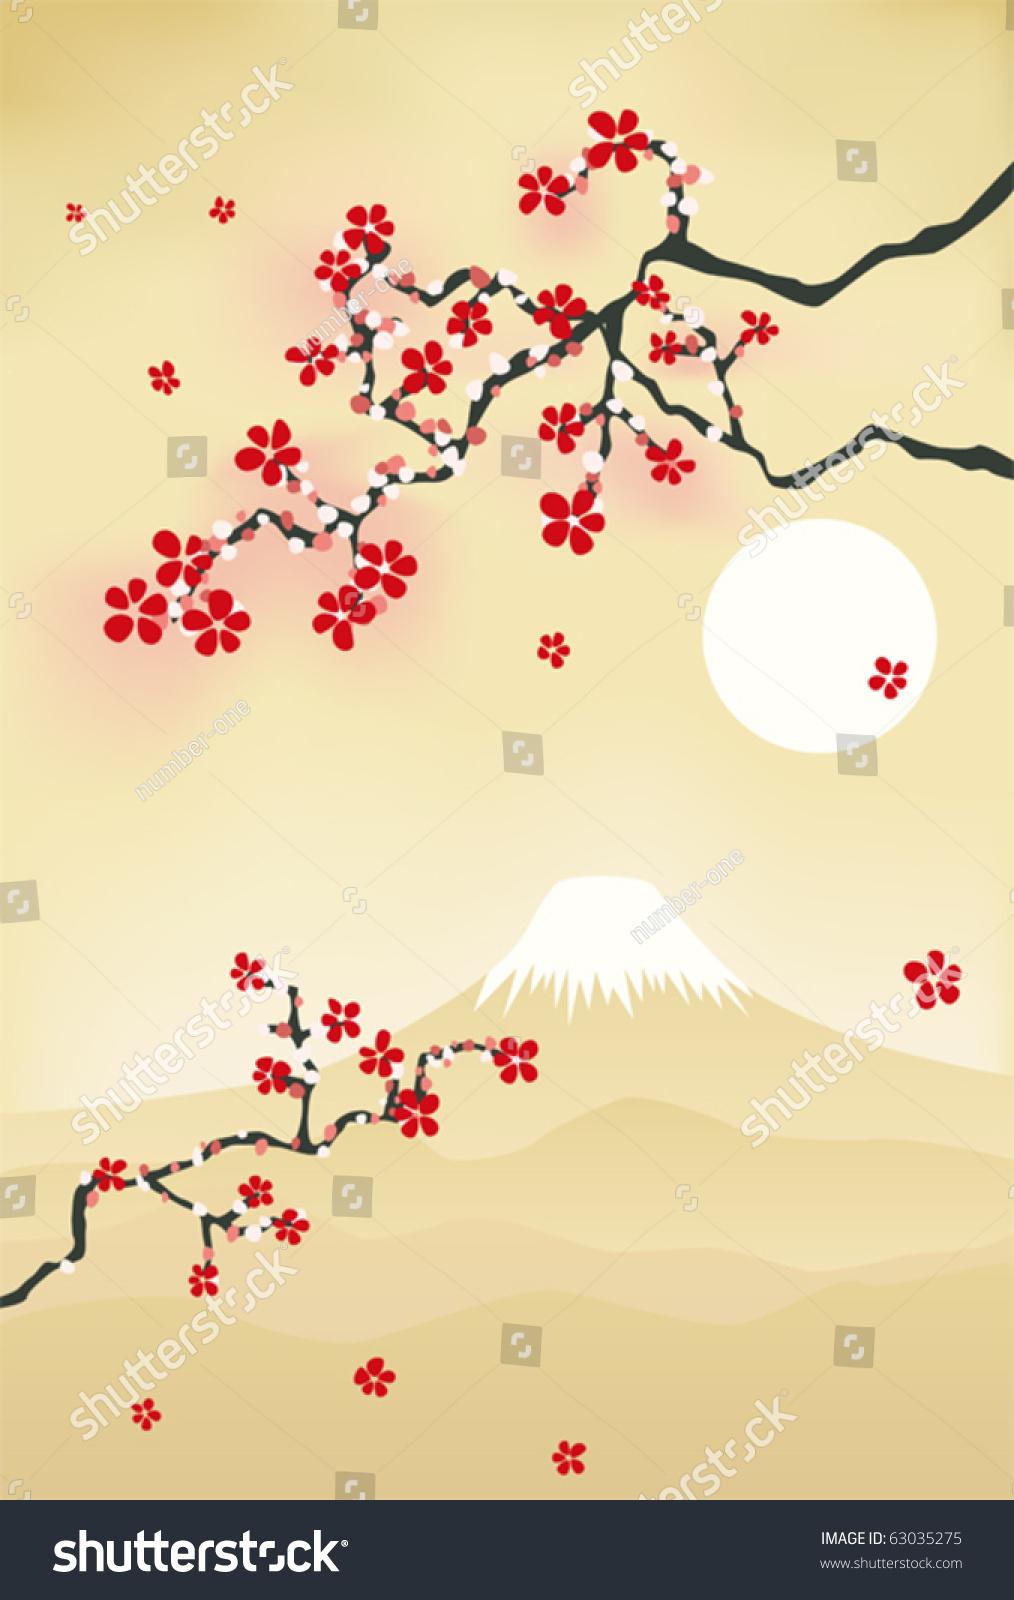 branch of cherry blossoms sakura with burgundy flowers | EZ Canvas